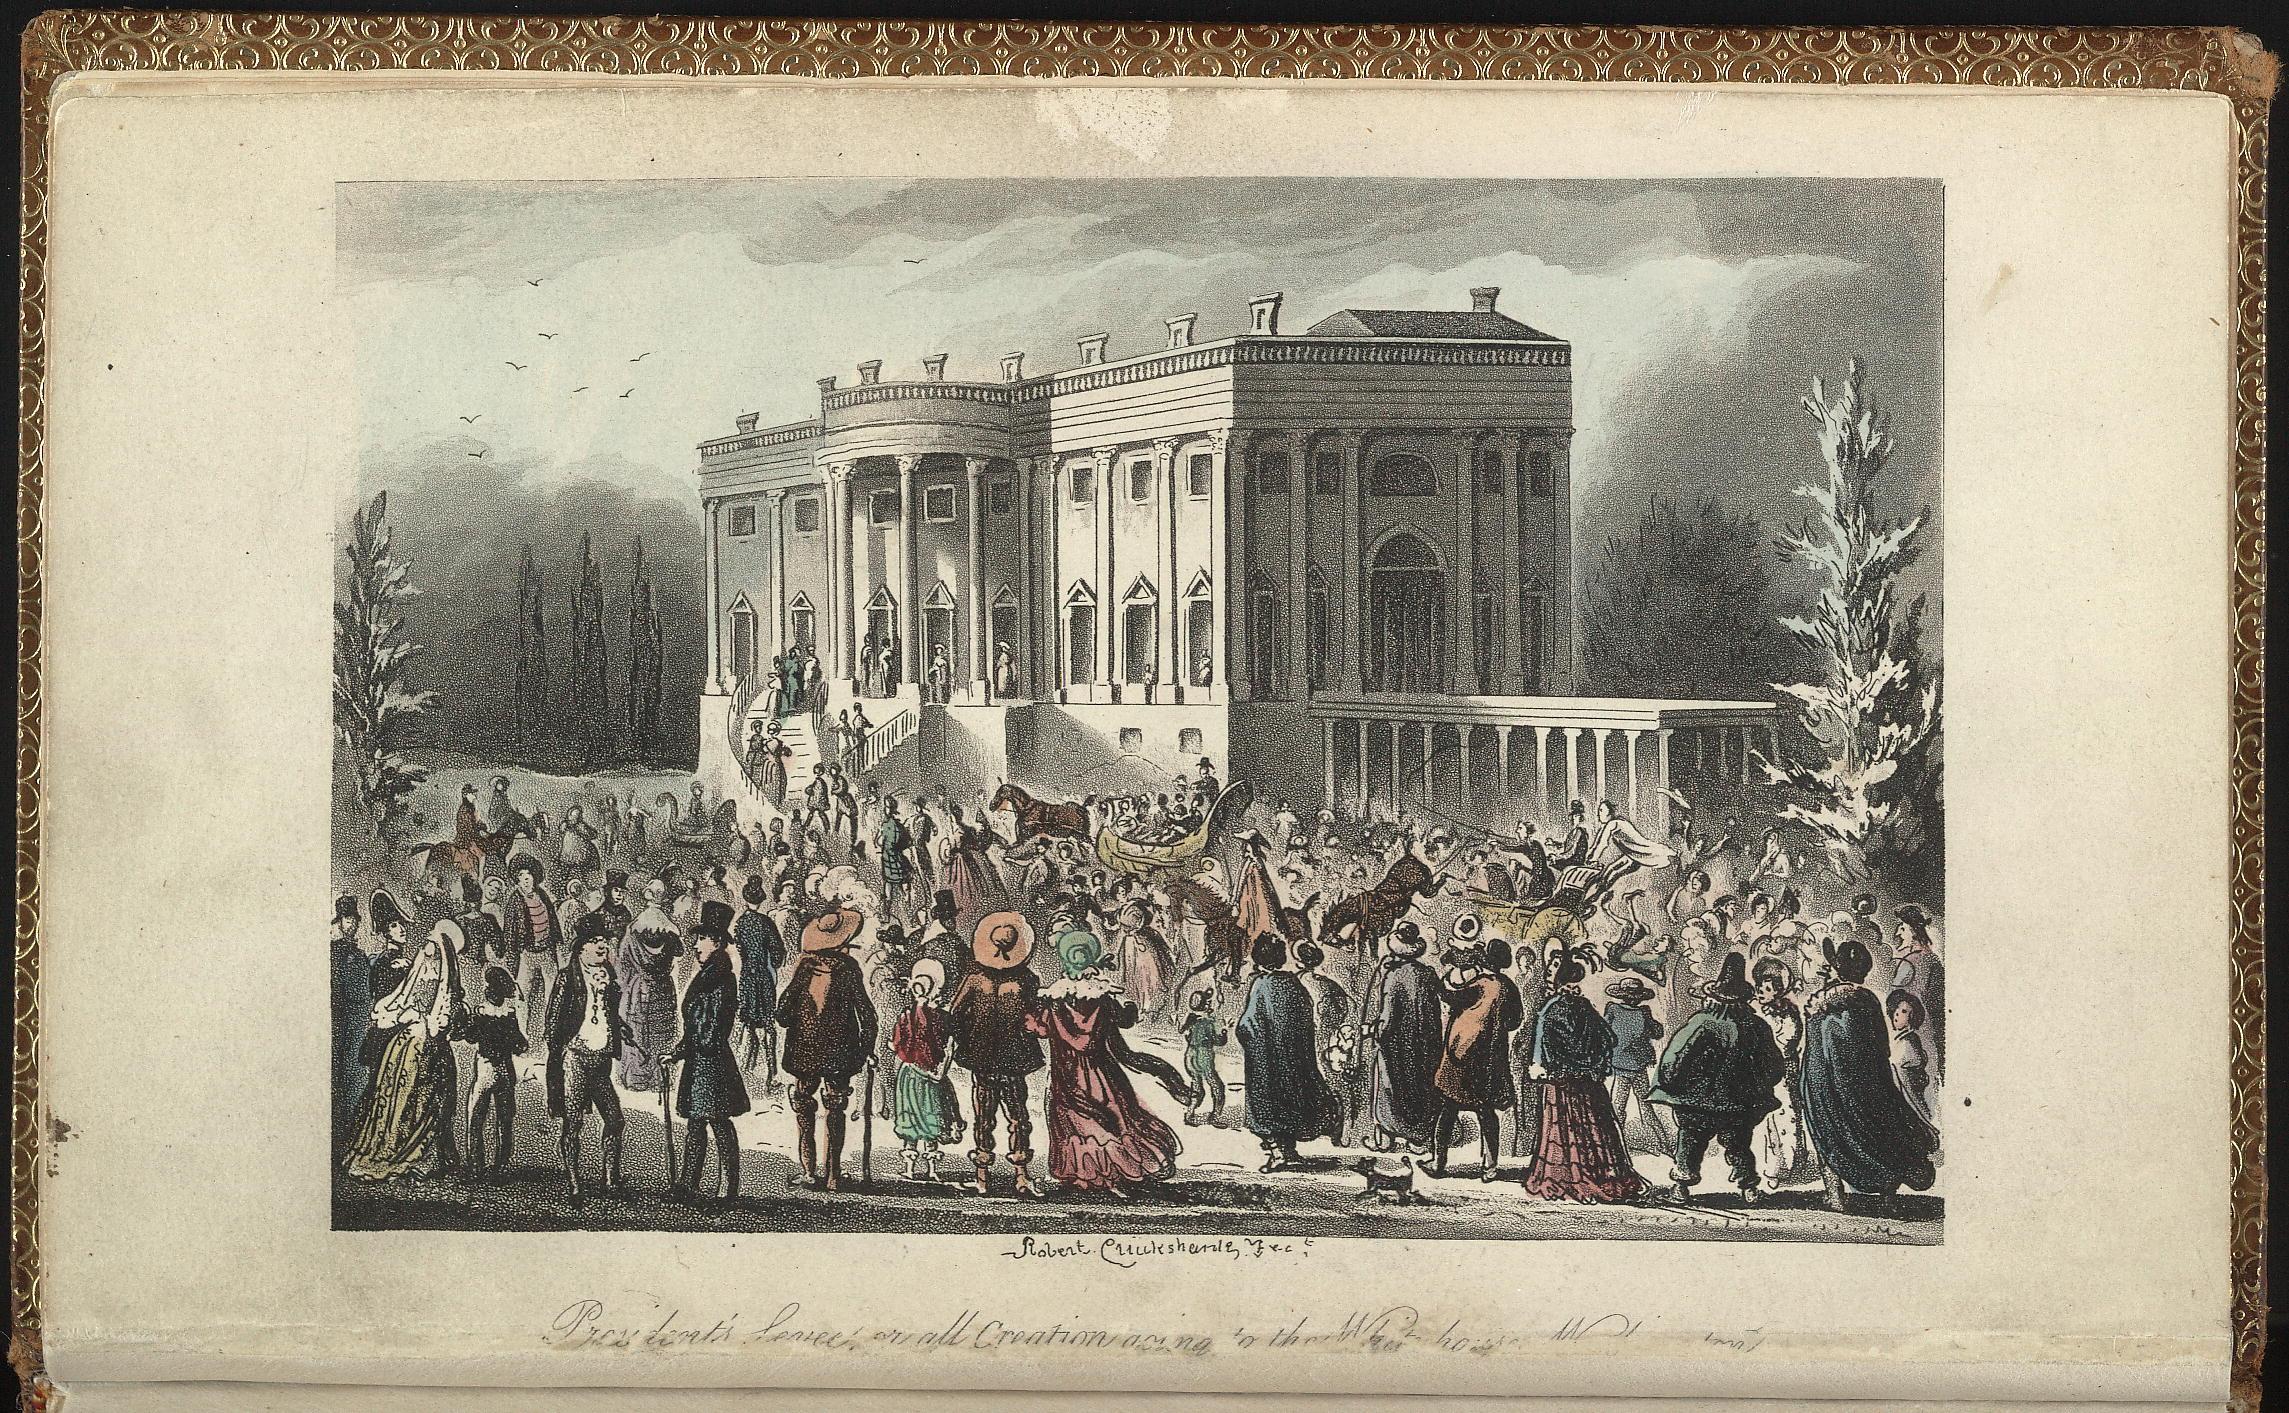 File:Jackson inauguration.jpg - Wikimedia Commons